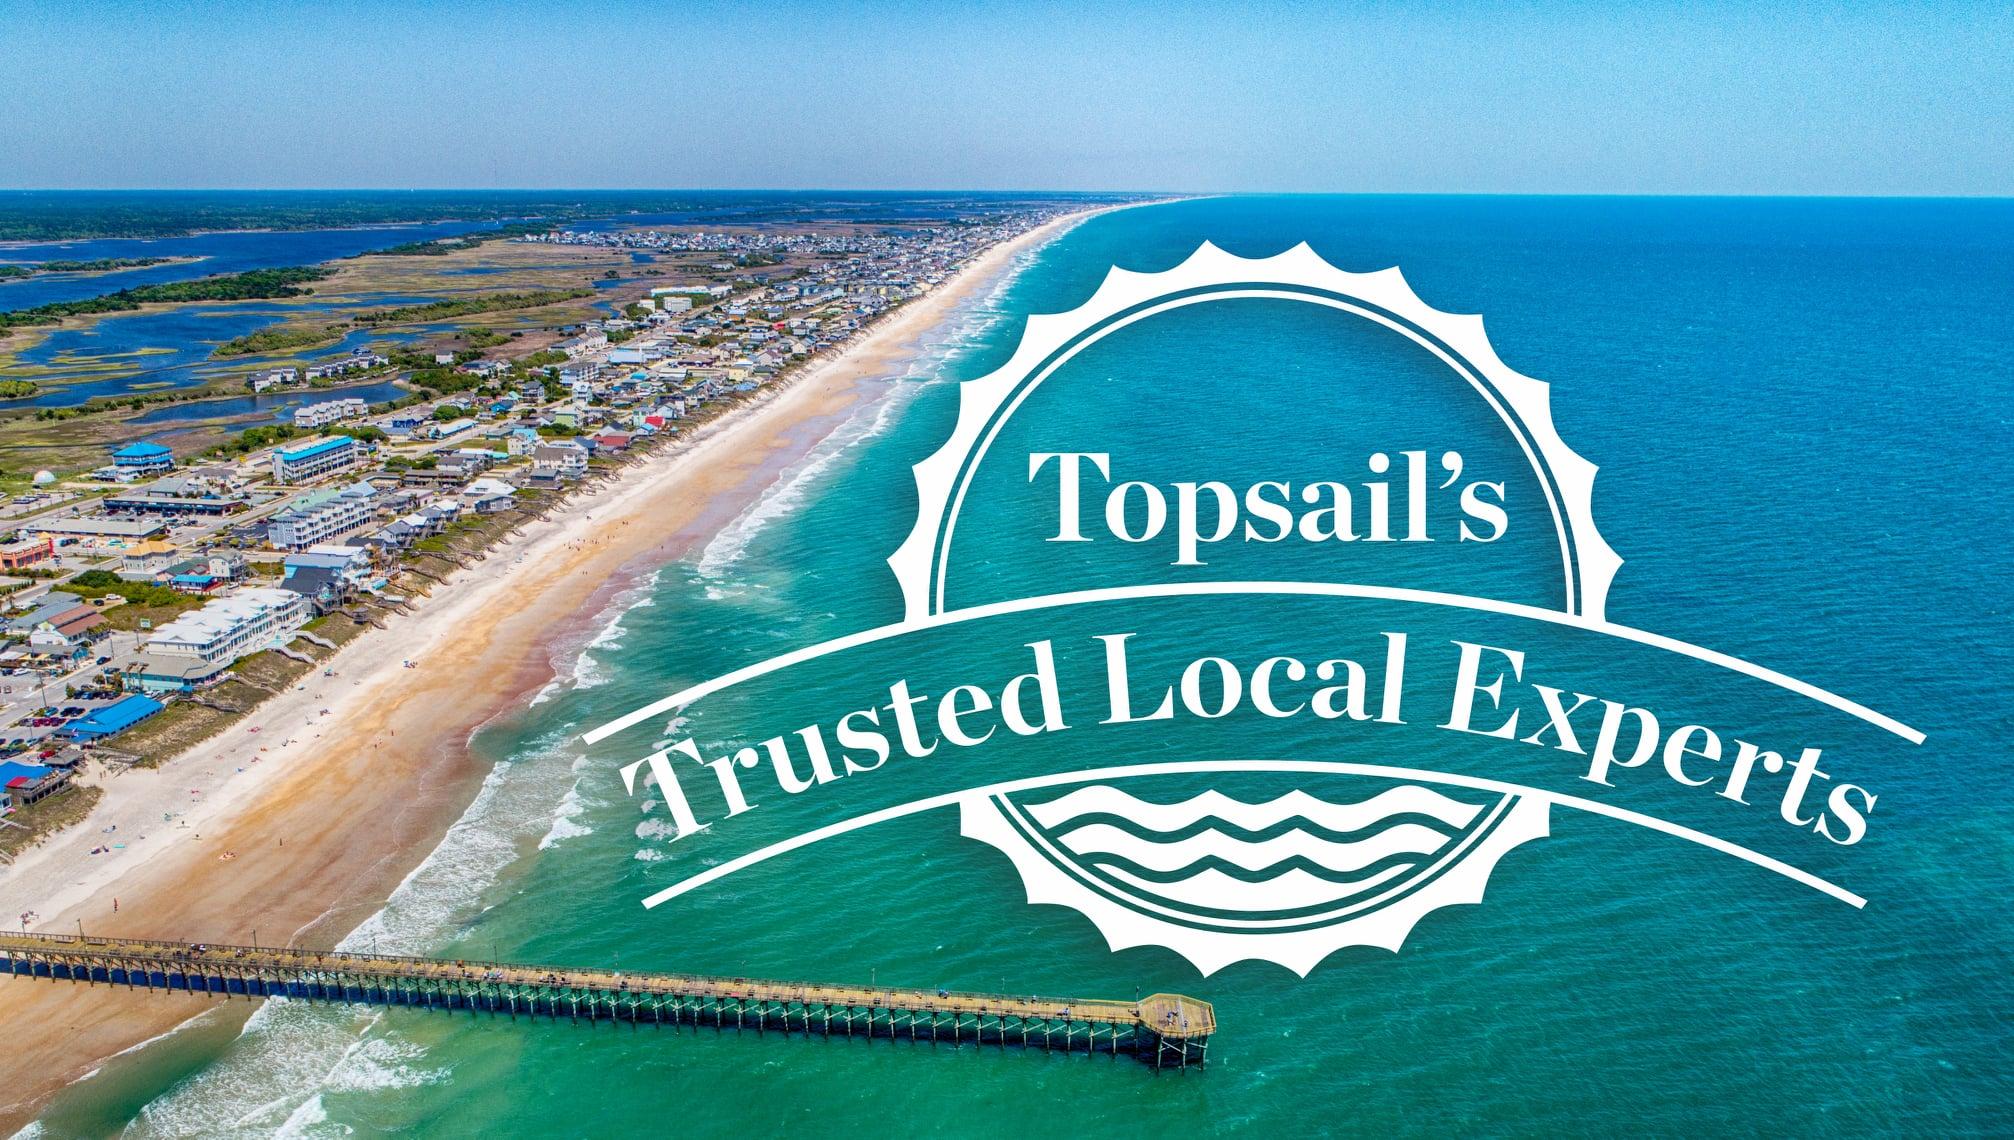 Treasure Realty Real Estate Property Management Vacation Rental Accommodations Company Topsail Island Coastal North Carolina